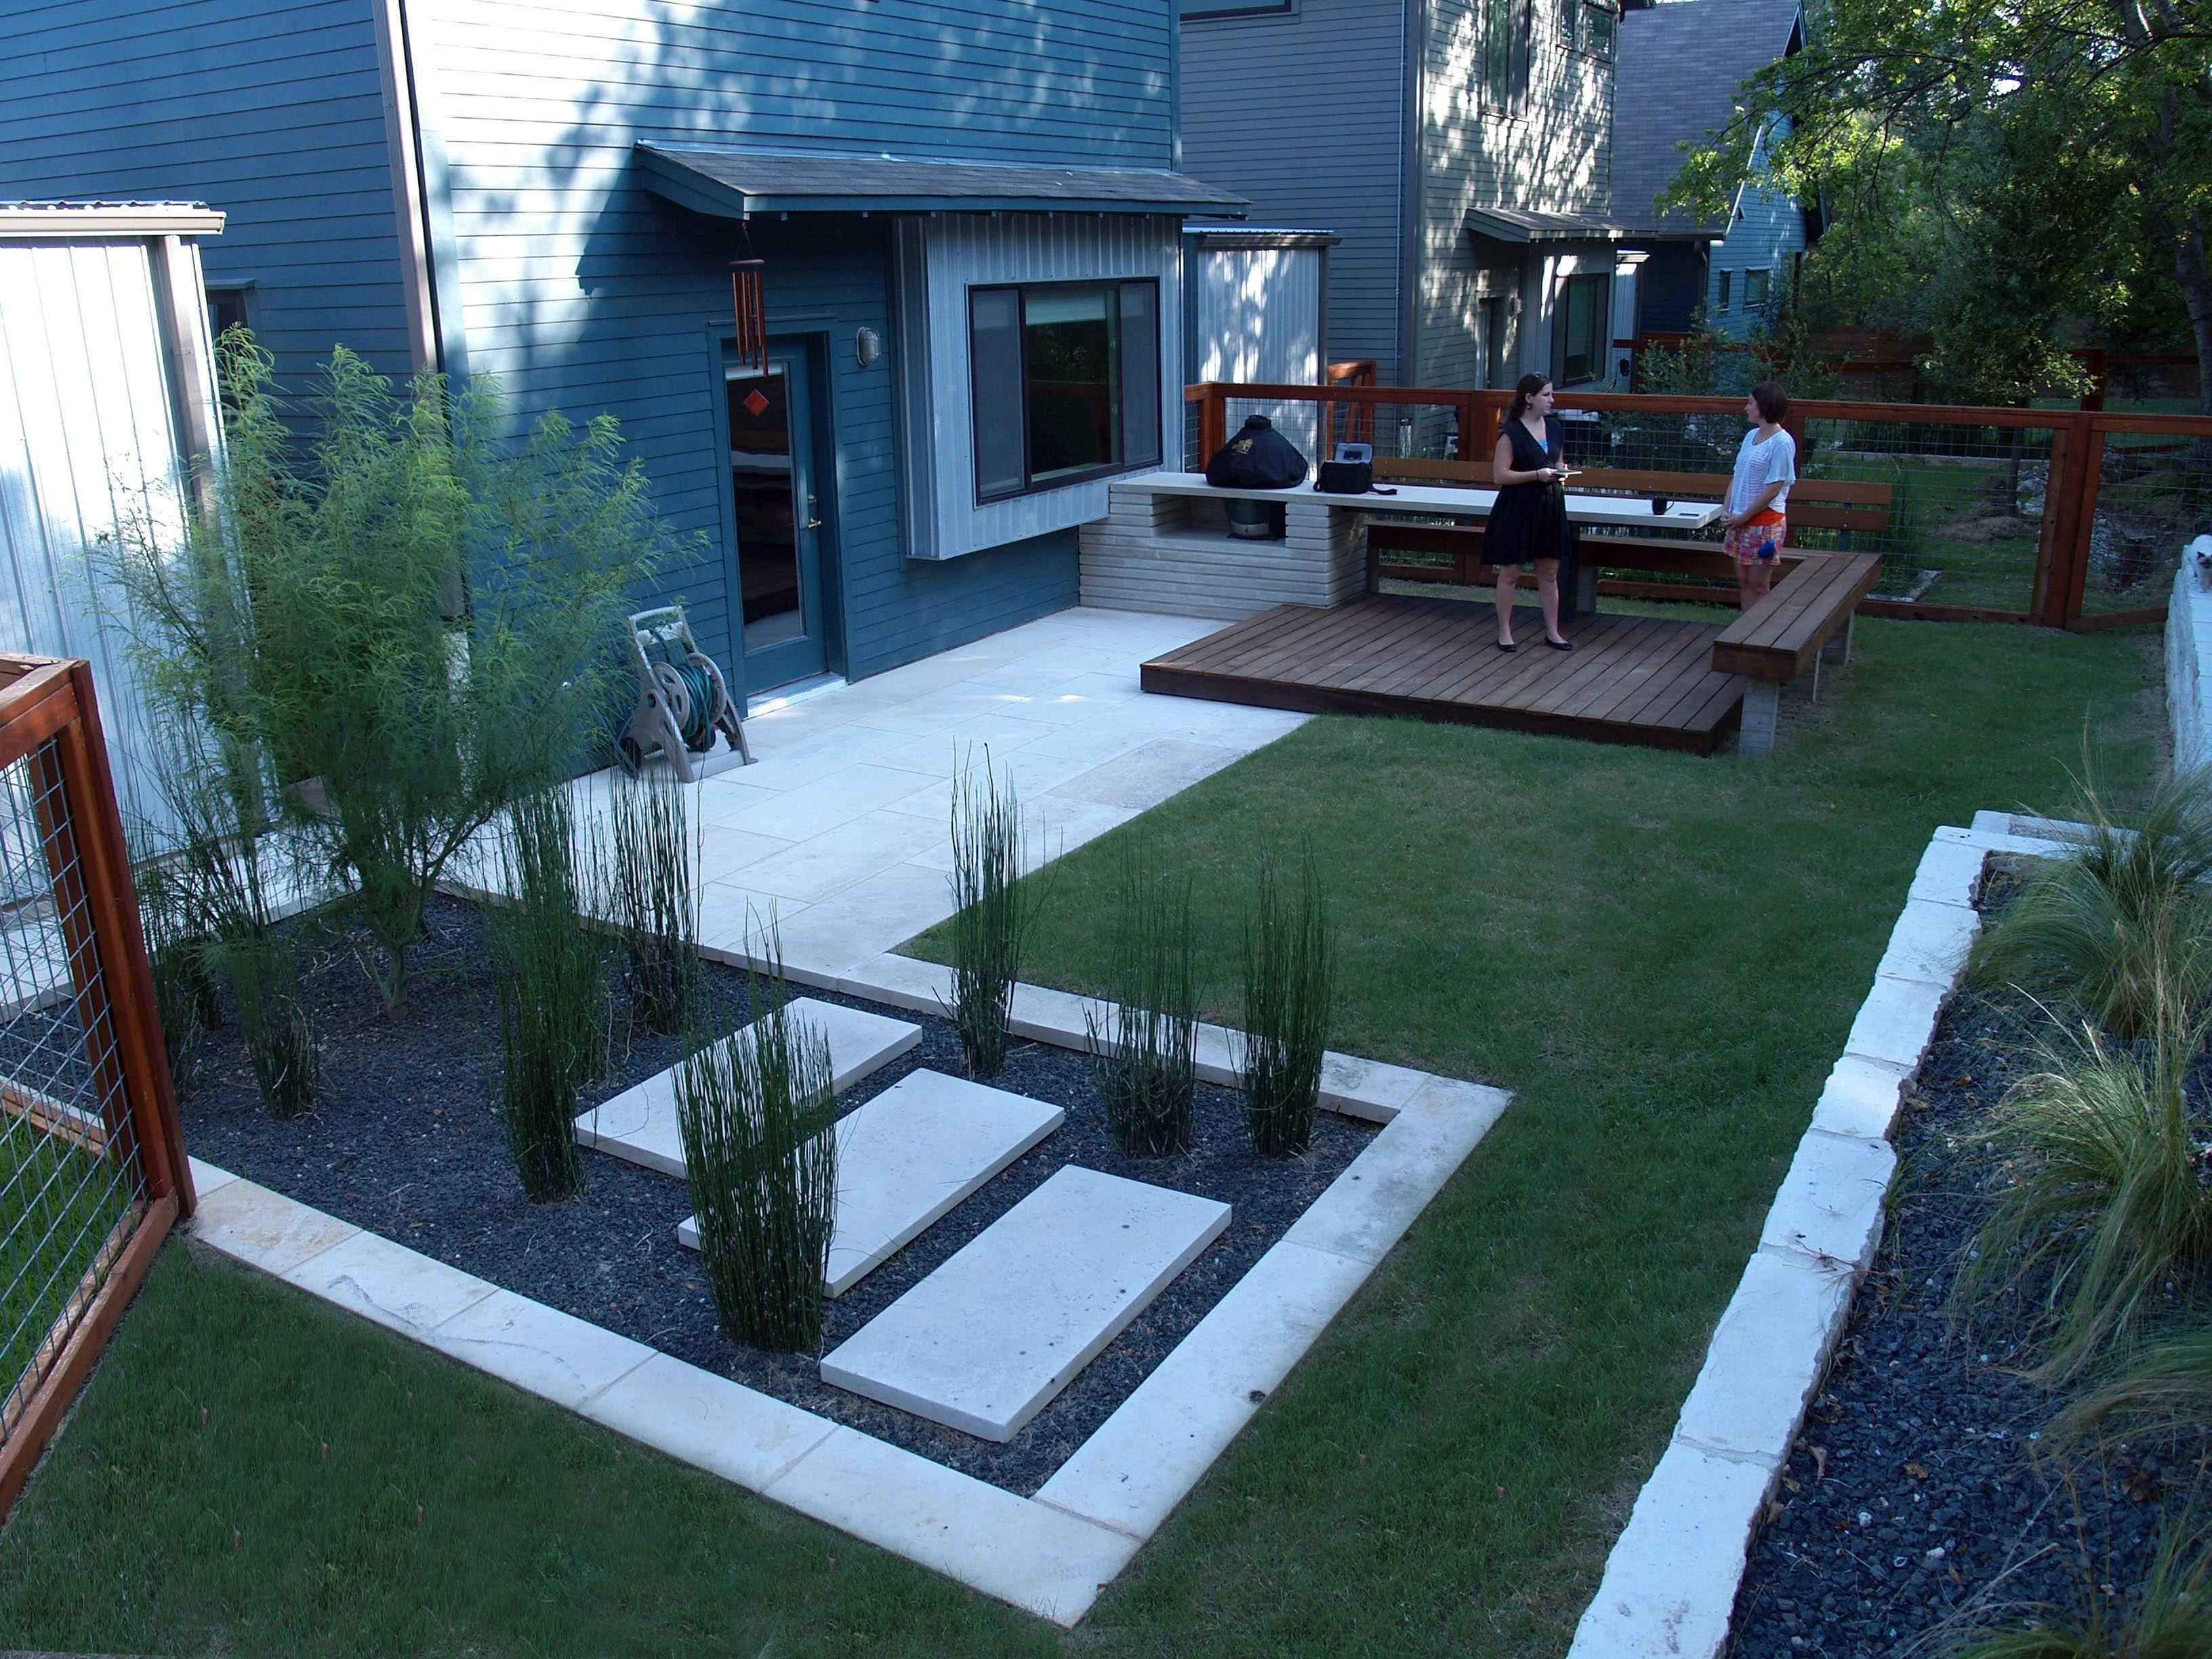 Marvelous 24 Marvelous Simple Backyard Landscaping Ideas ...